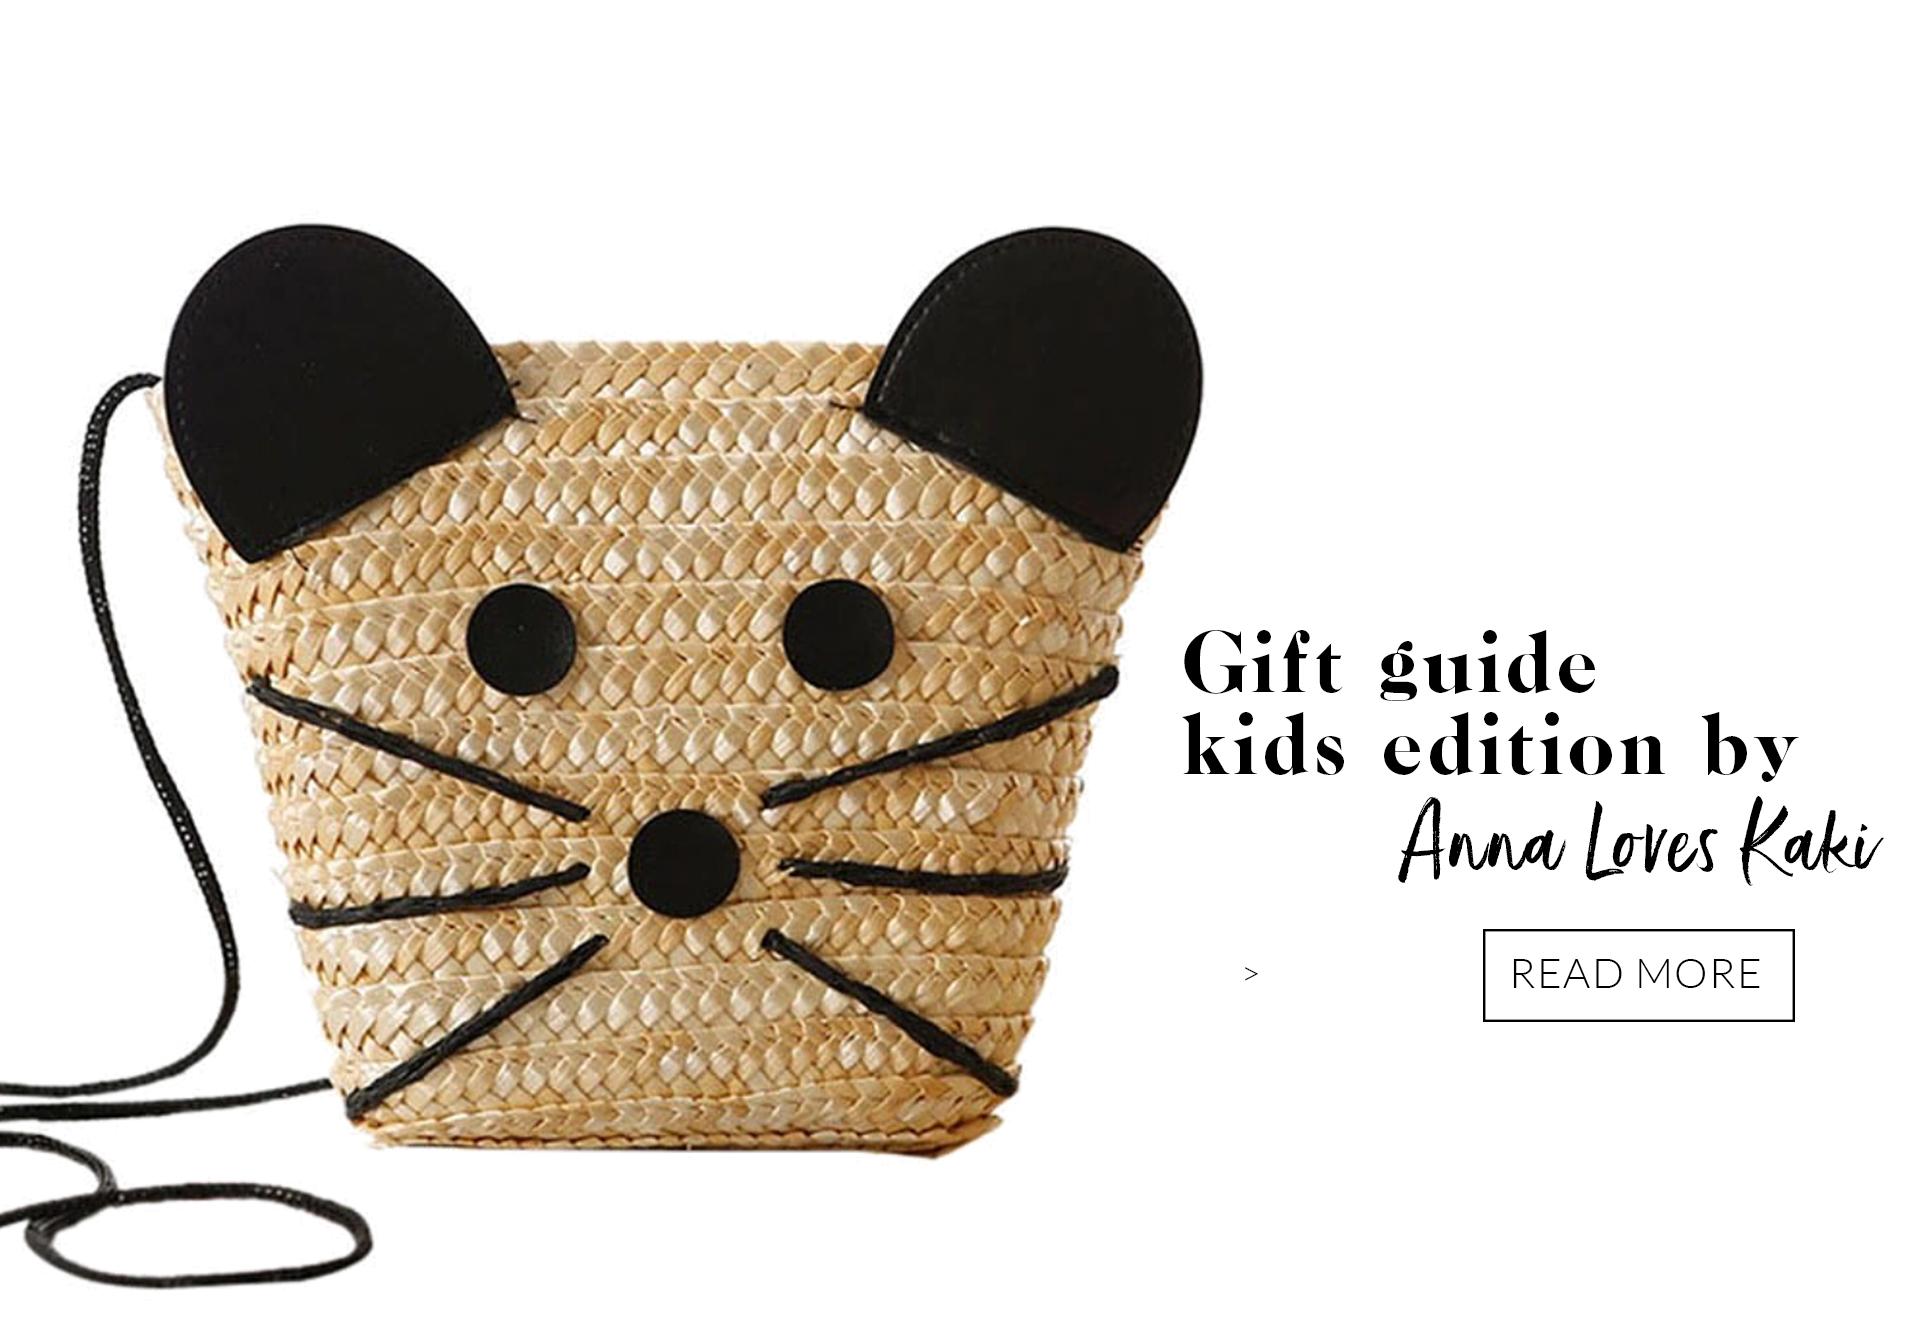 kids gift guide - Gift guide kids edition by Anna Loves Kaki